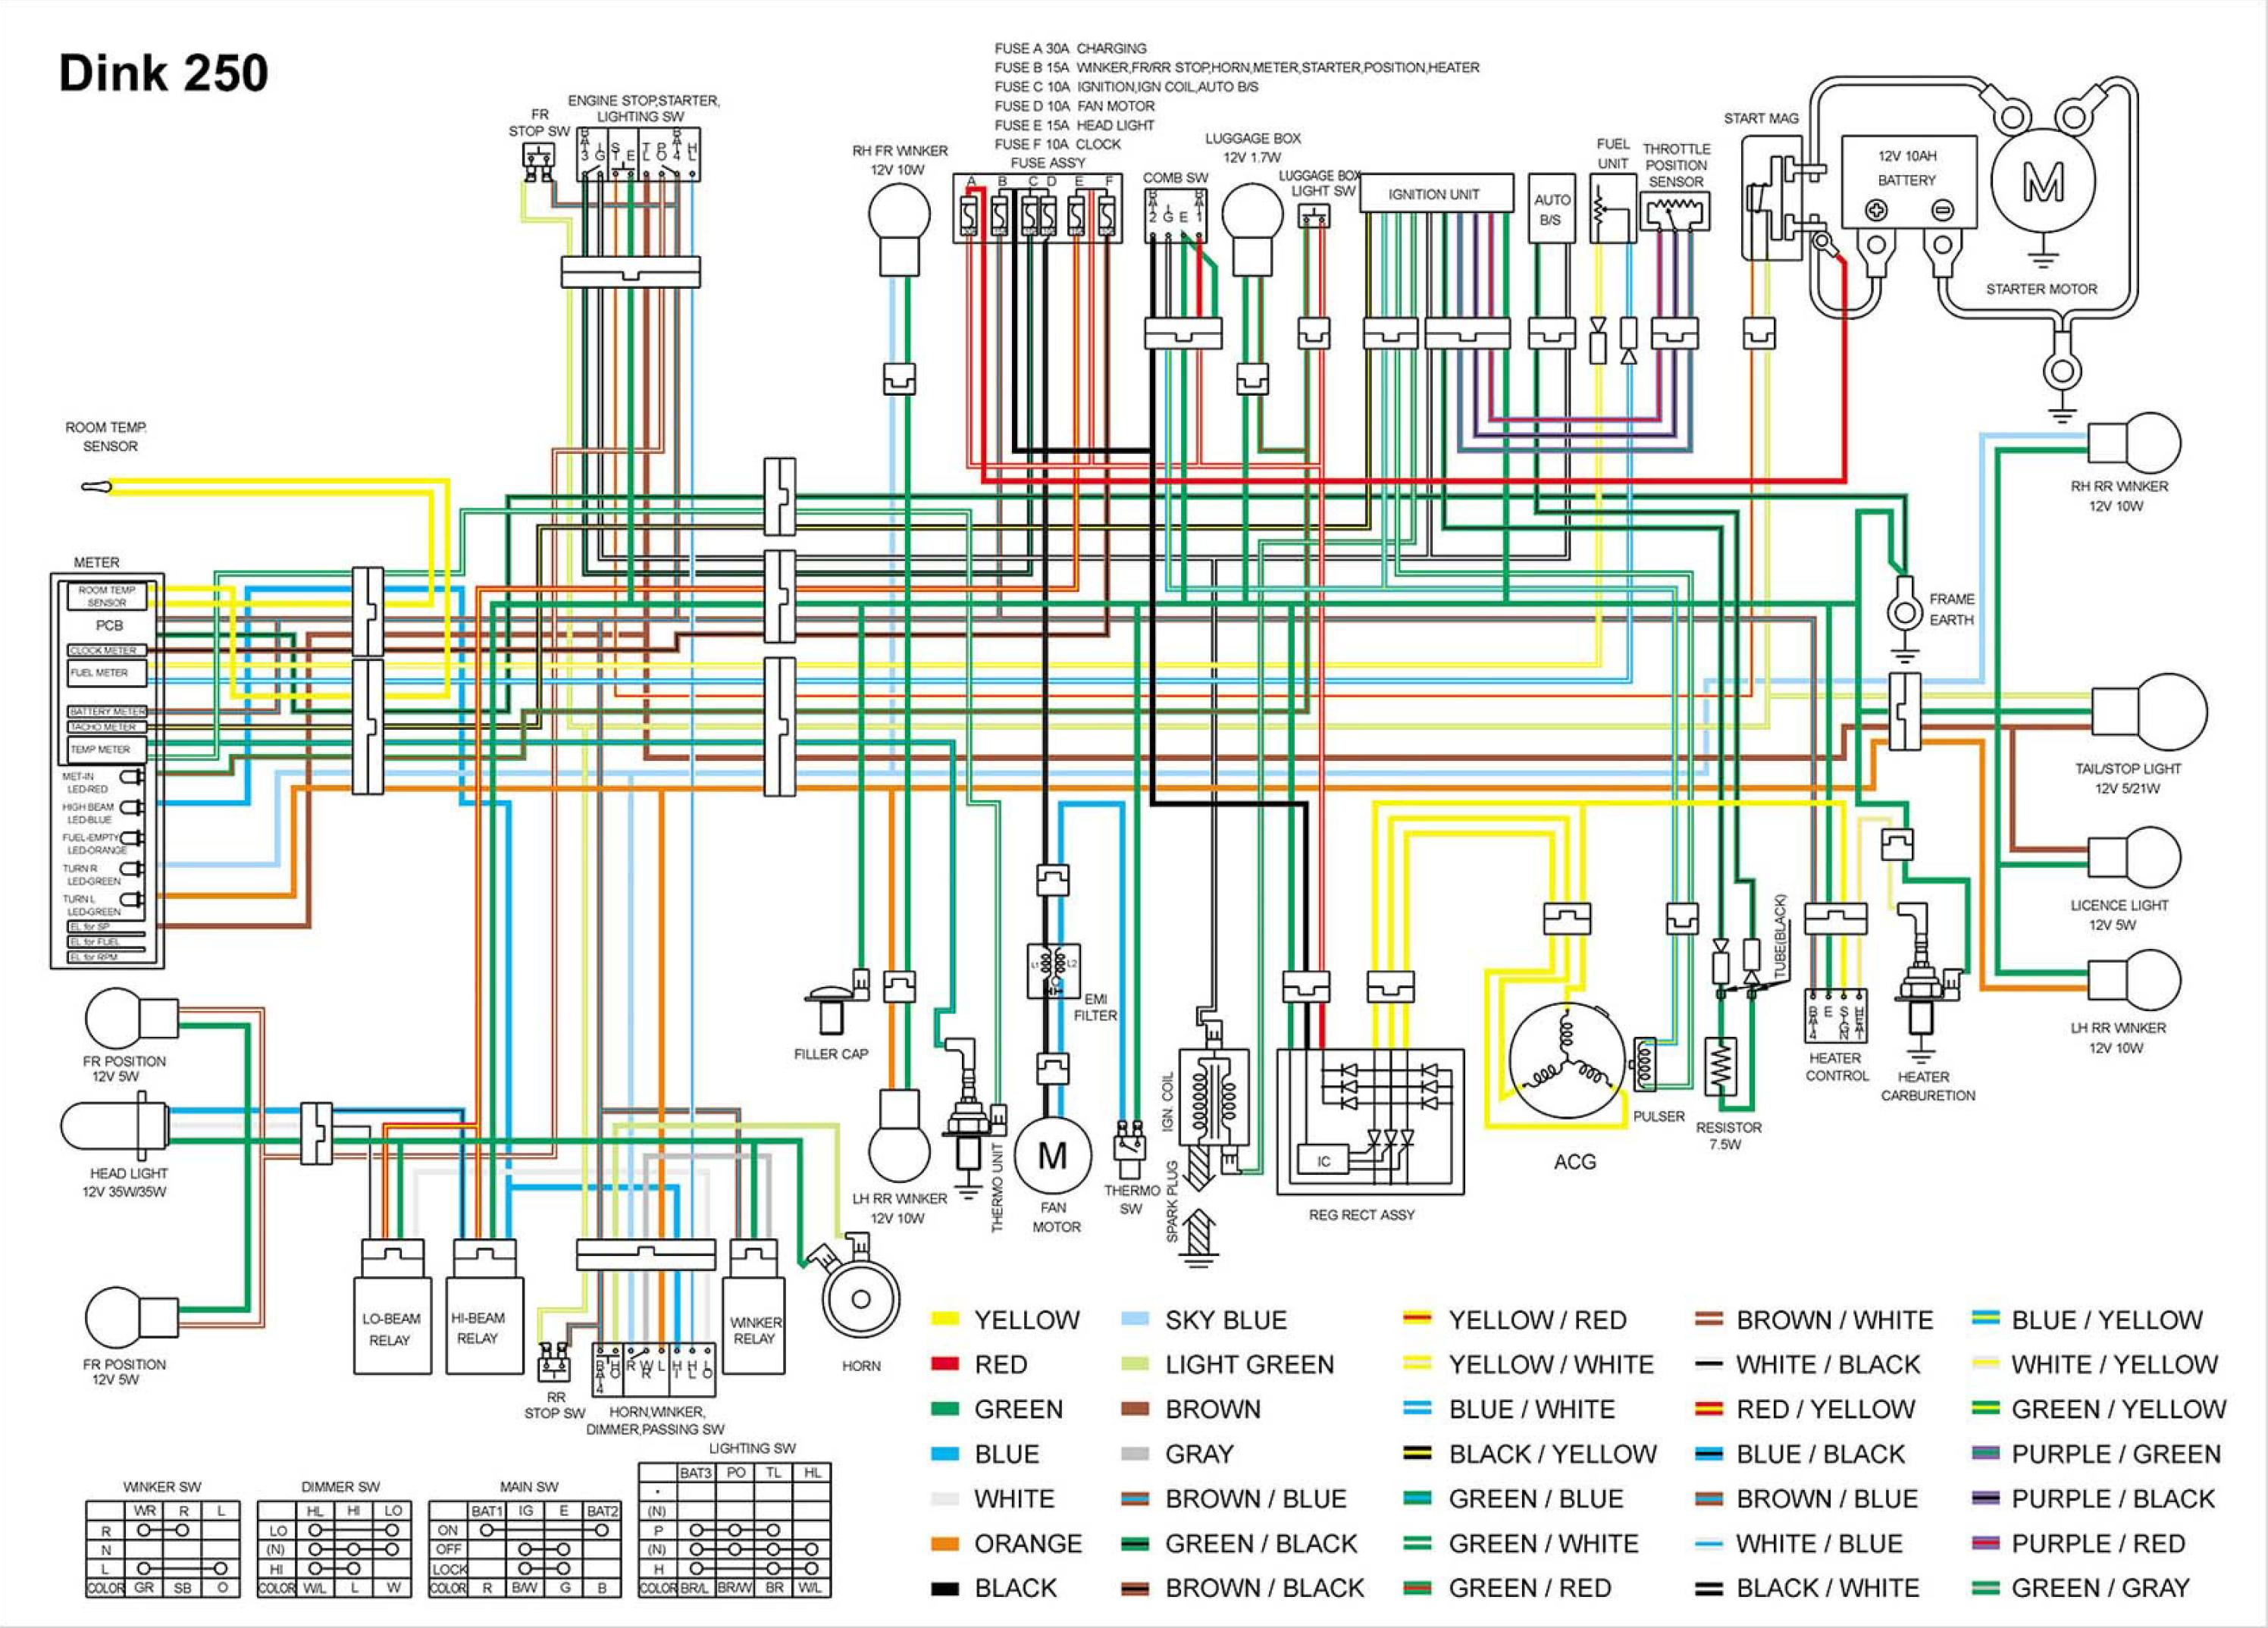 Xr200r Wiring Diagram Auto Electrical 1986 Chevrolet Dual Tank Honda Crf50 Cdi